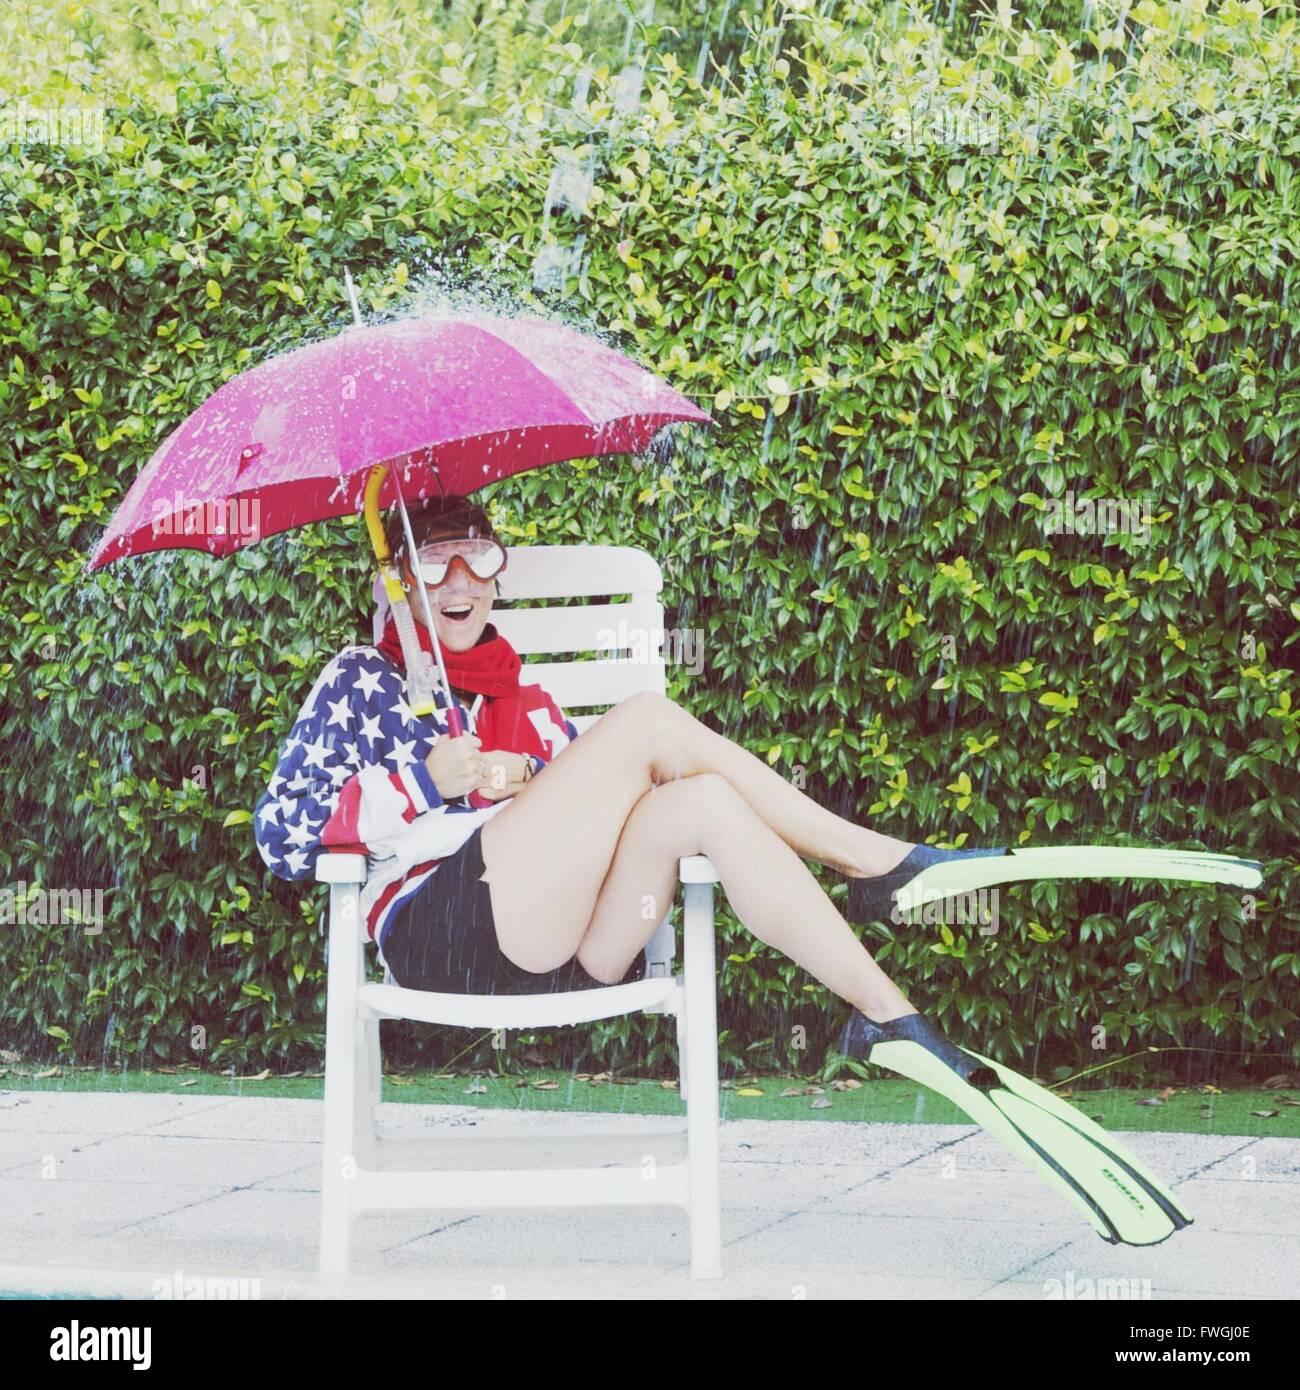 Woman holding umbrella in rain - Stock Image